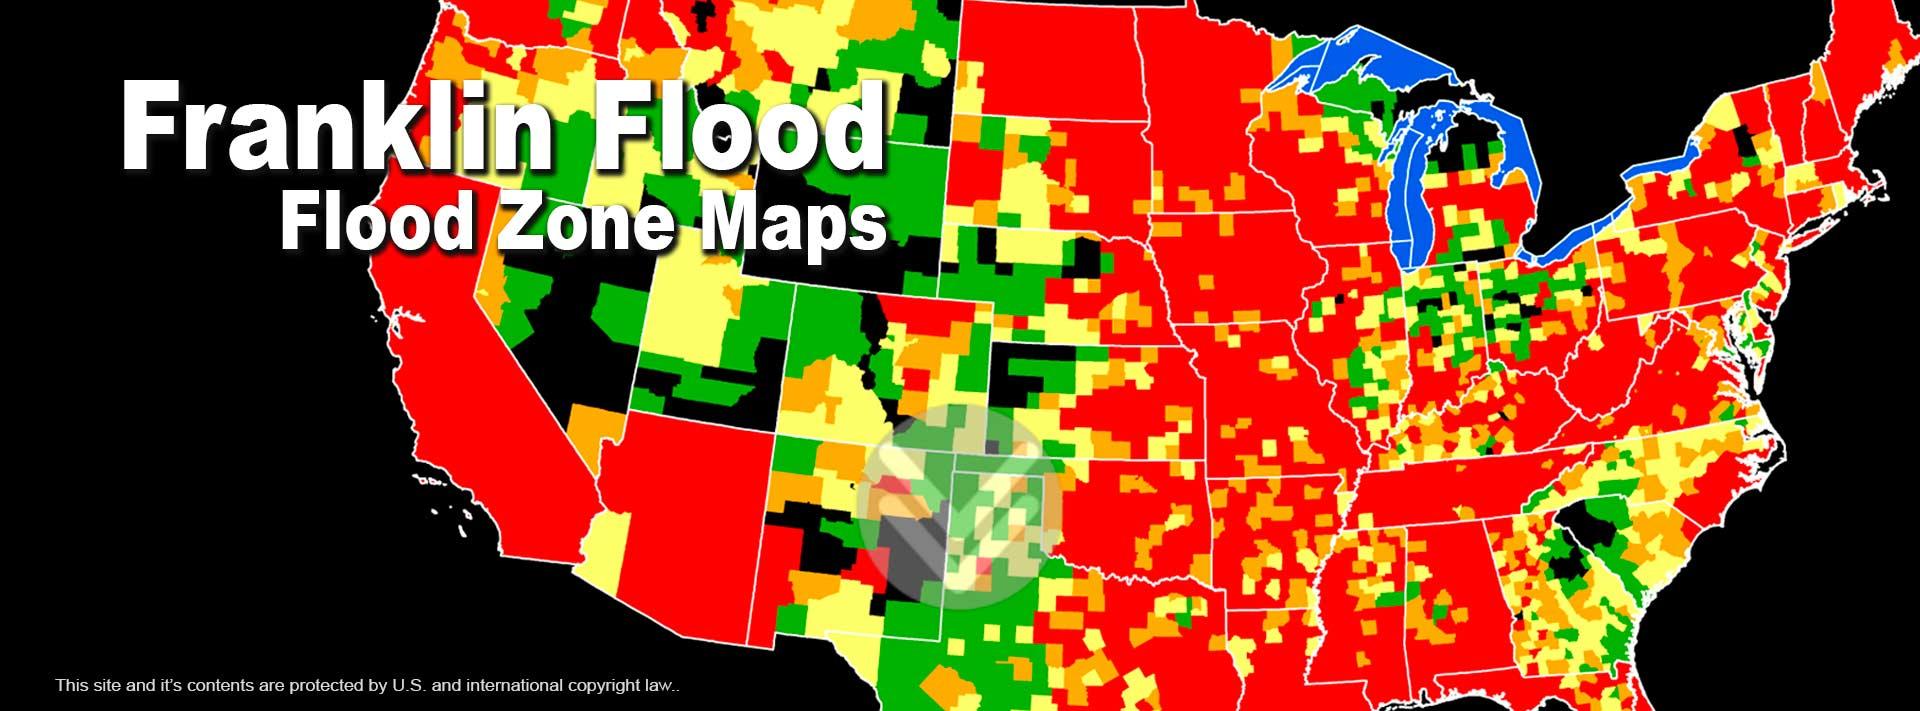 Flood Zone Rate Maps Explained - Florida Flood Plain Map